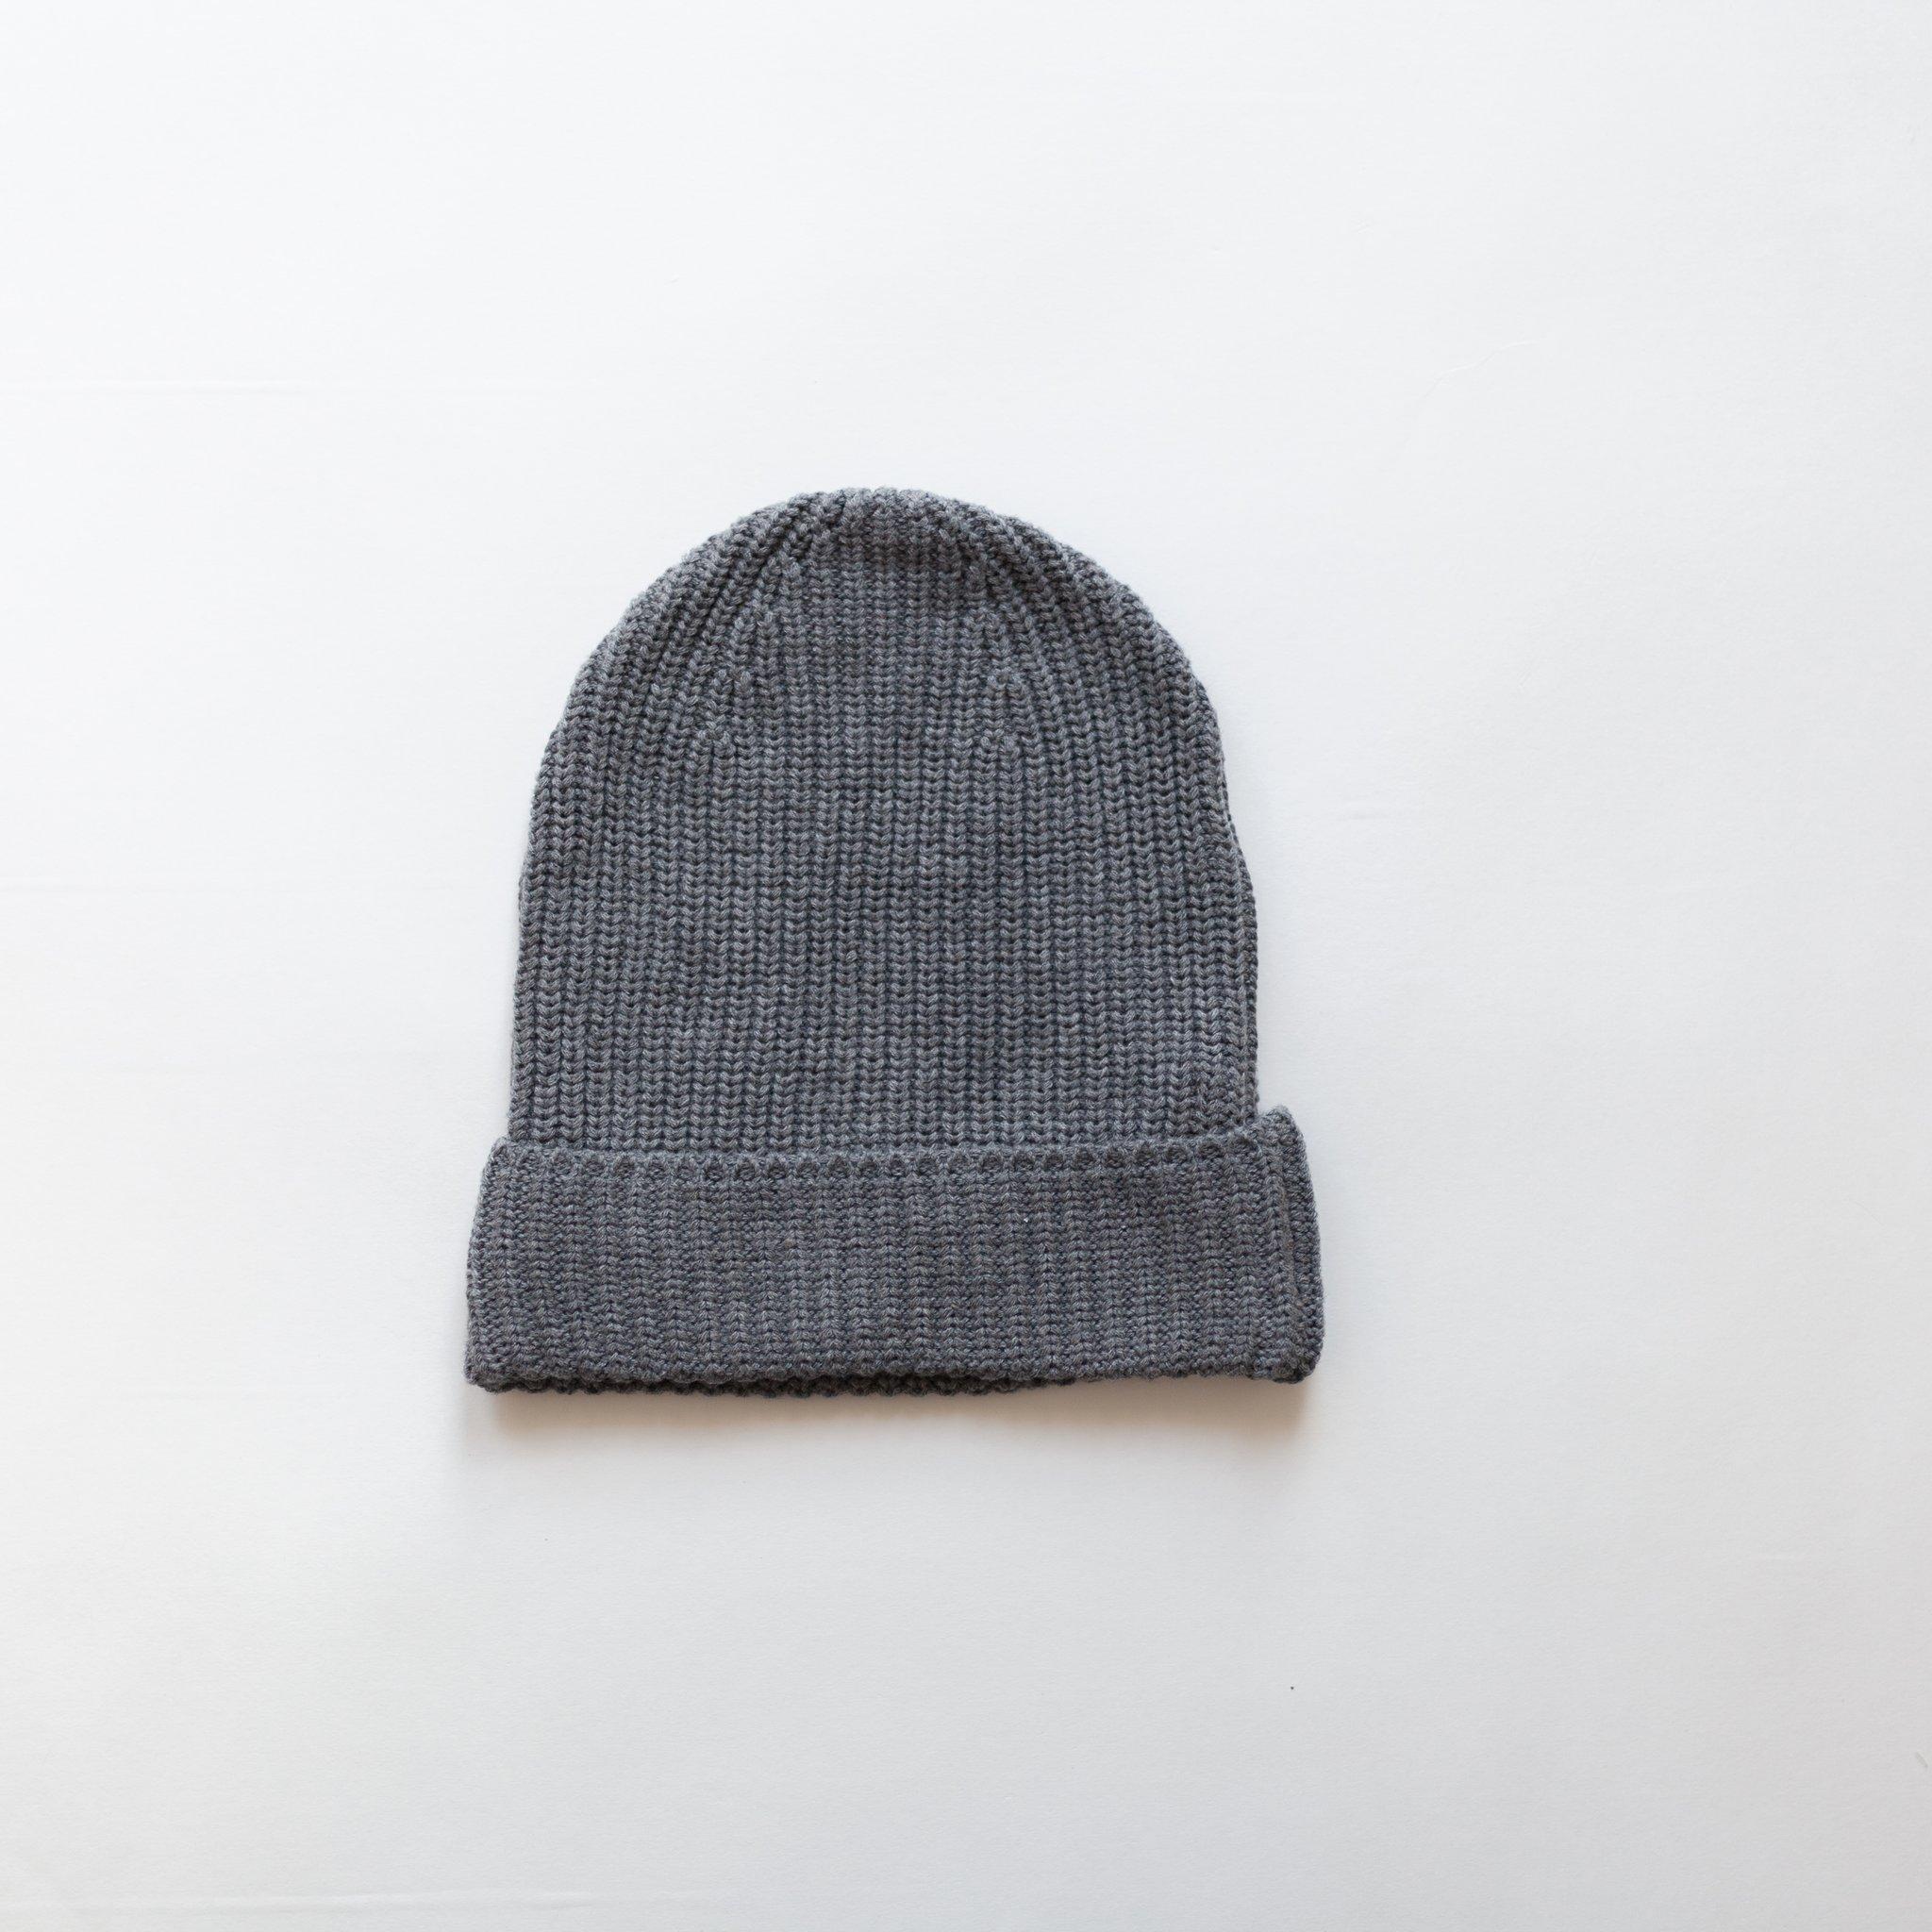 KINDLY (Tidligere Fieldday) Kids chunky knit beanie - 6 farger -